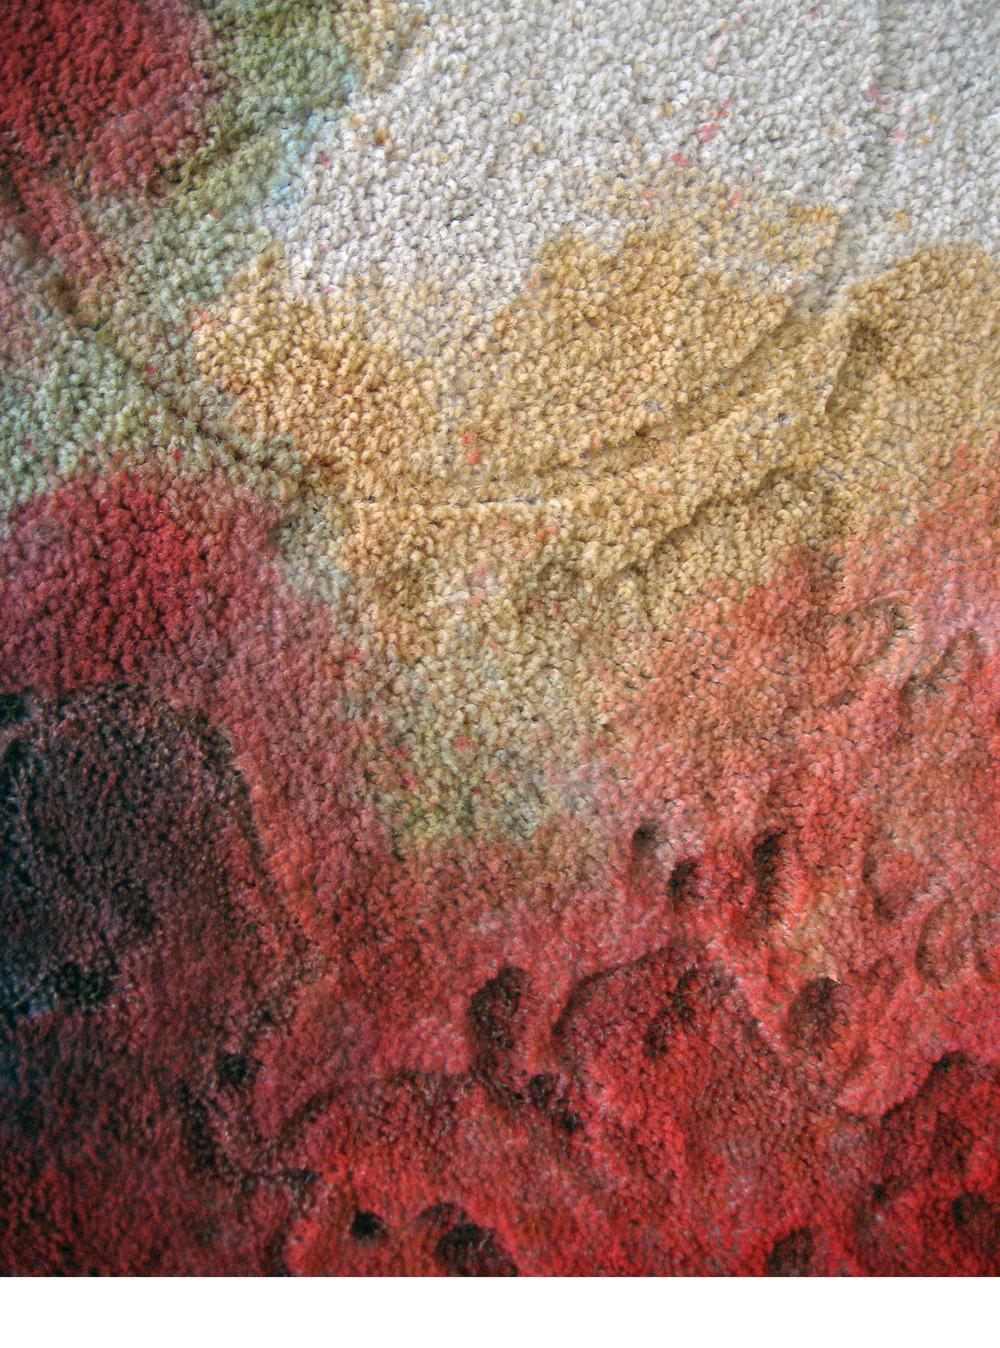 Matias Cuevas - Almost There #2 Detail ©Matias Cuevas